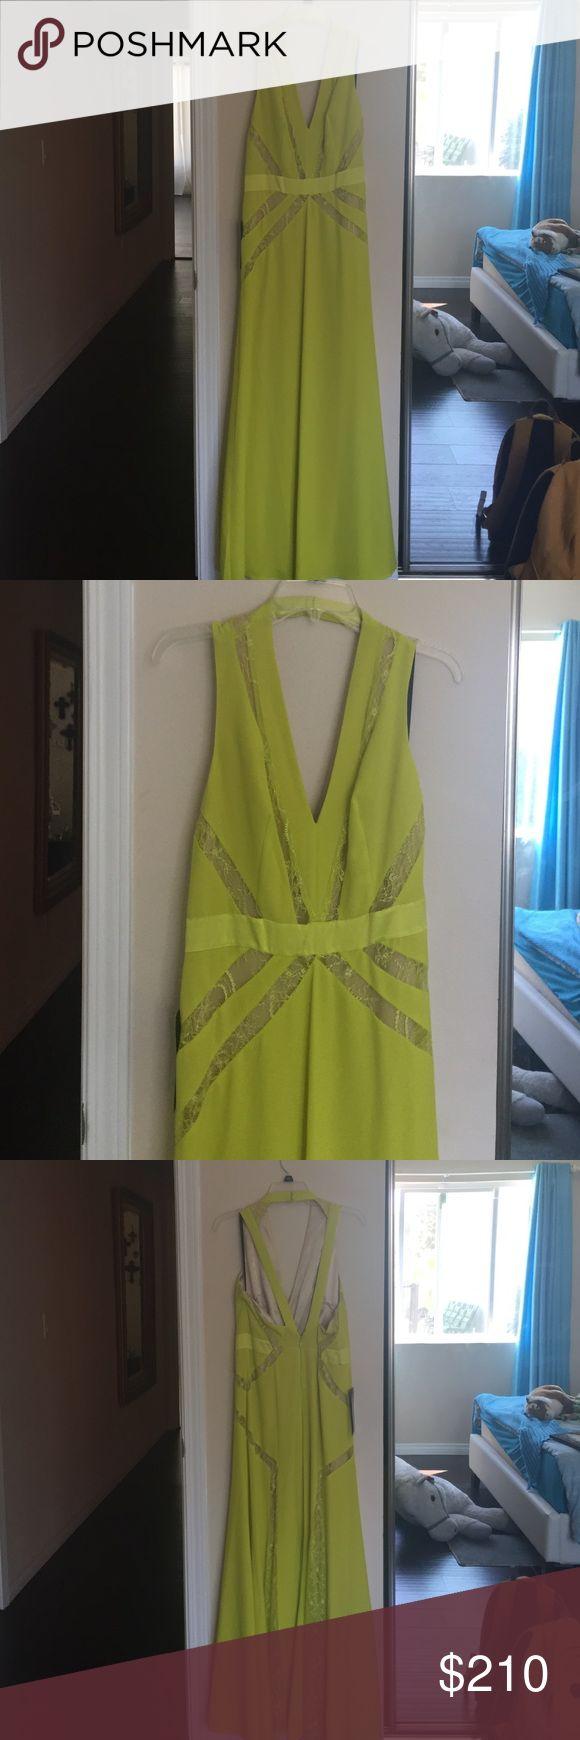 Yellow/green long dress Yellow/green long dress bebe Dresses Prom